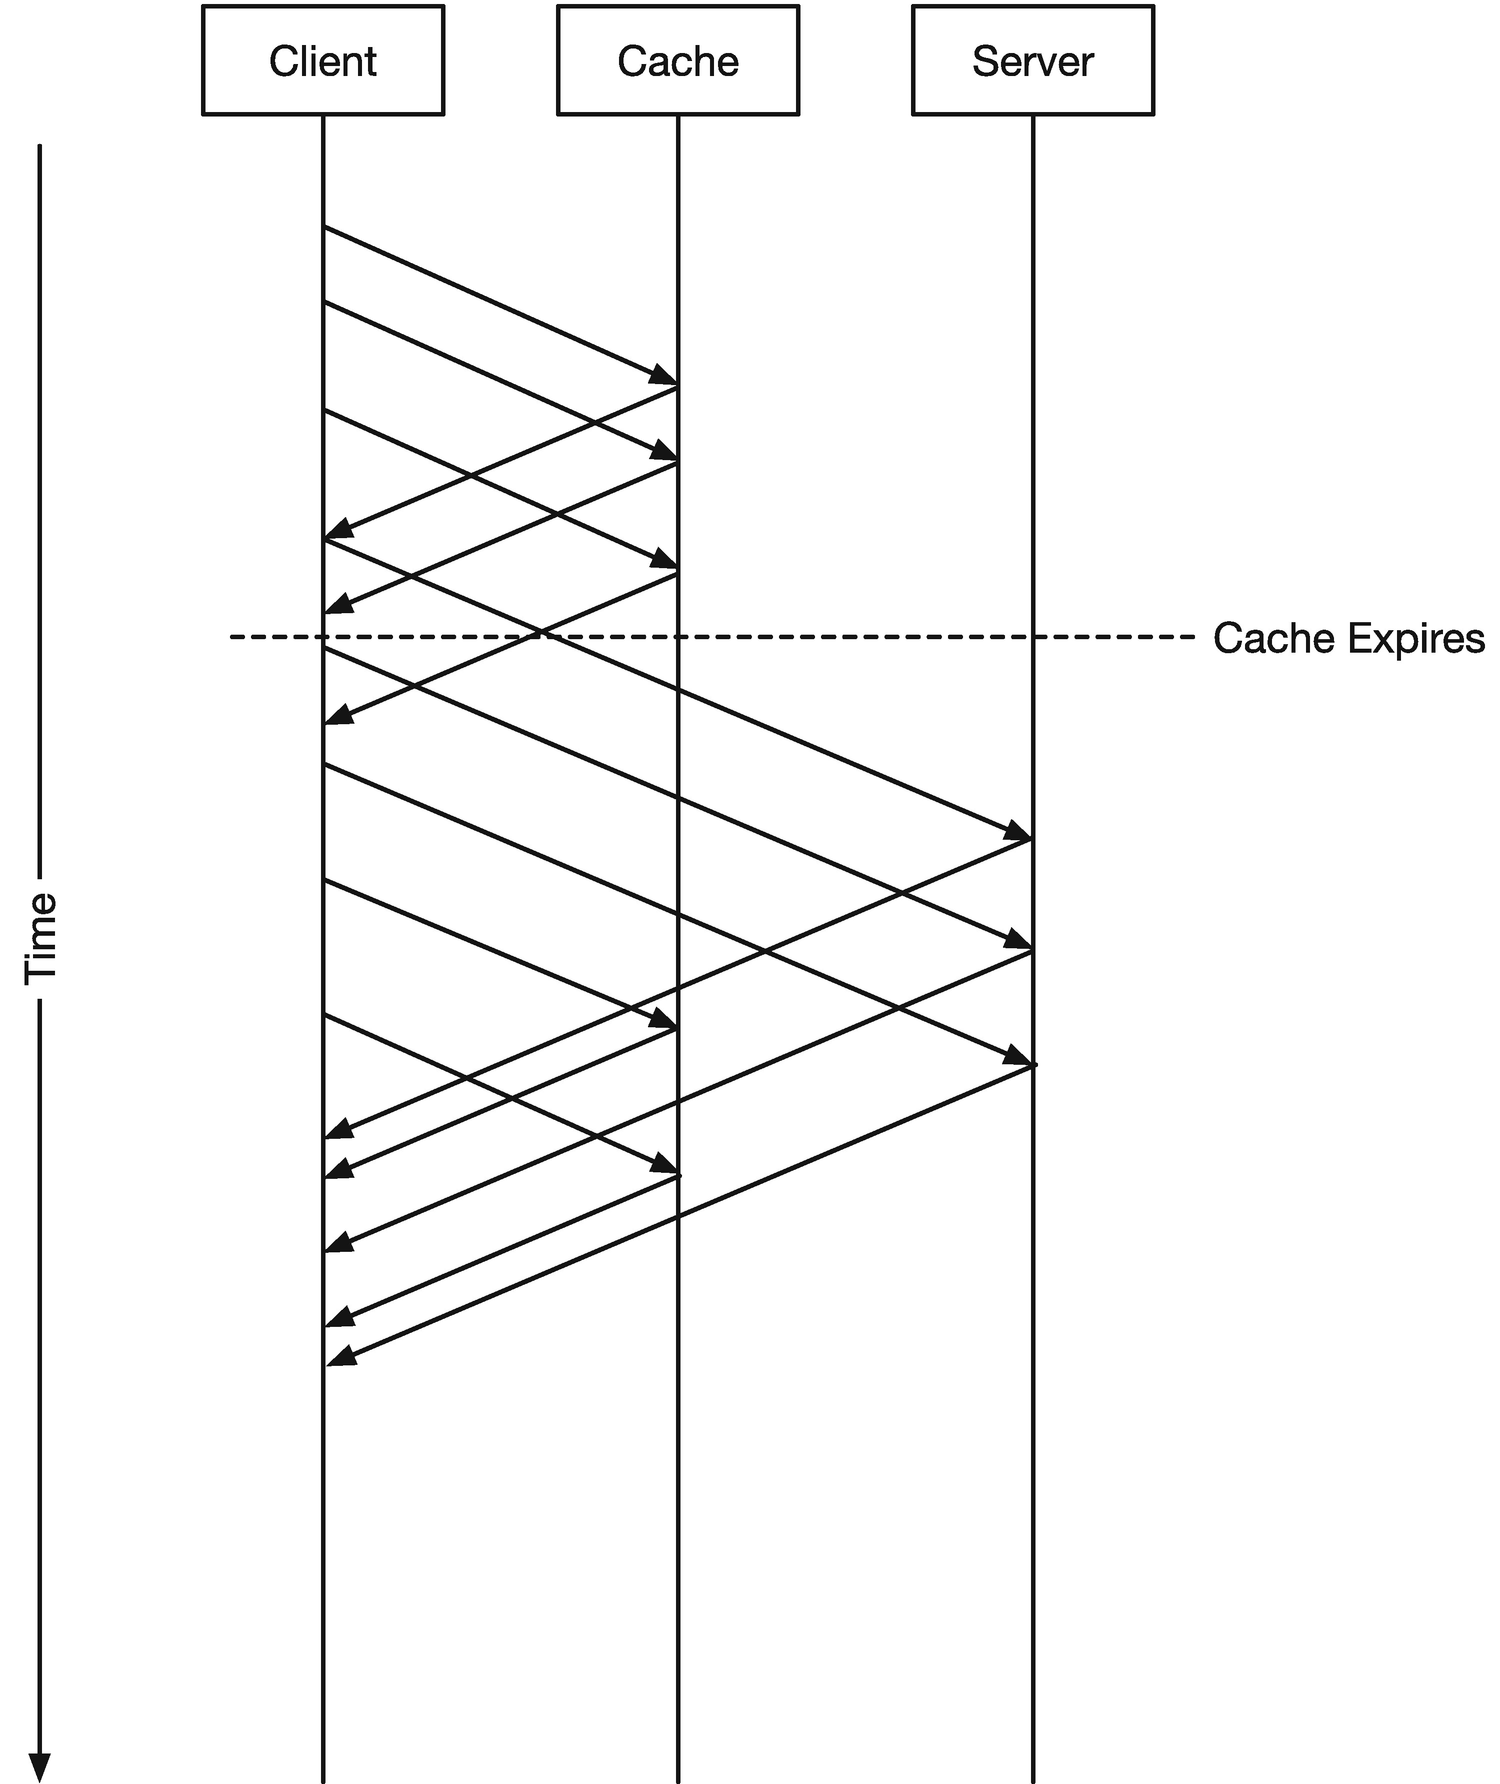 APIs | SpringerLink